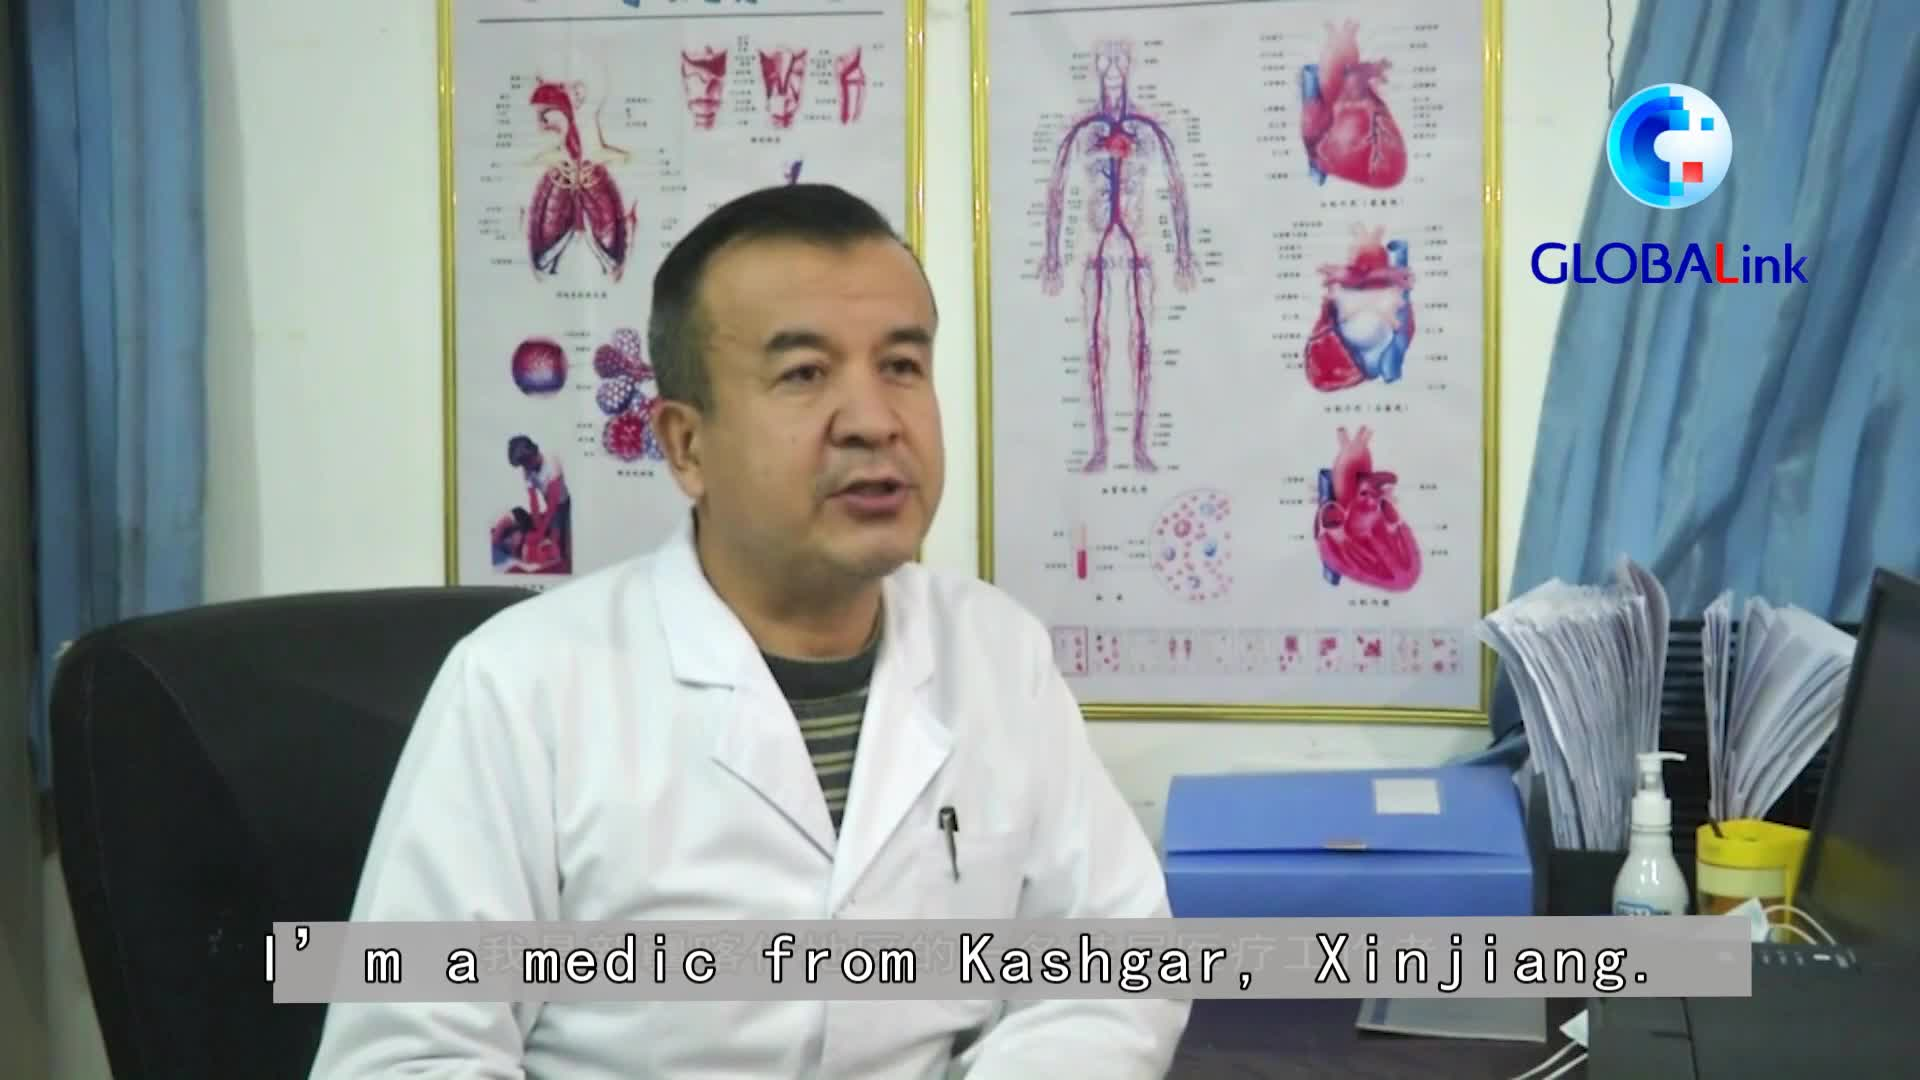 GLOBALink | #RealLifeXinjiang: A medic on Xinjiang's public health service